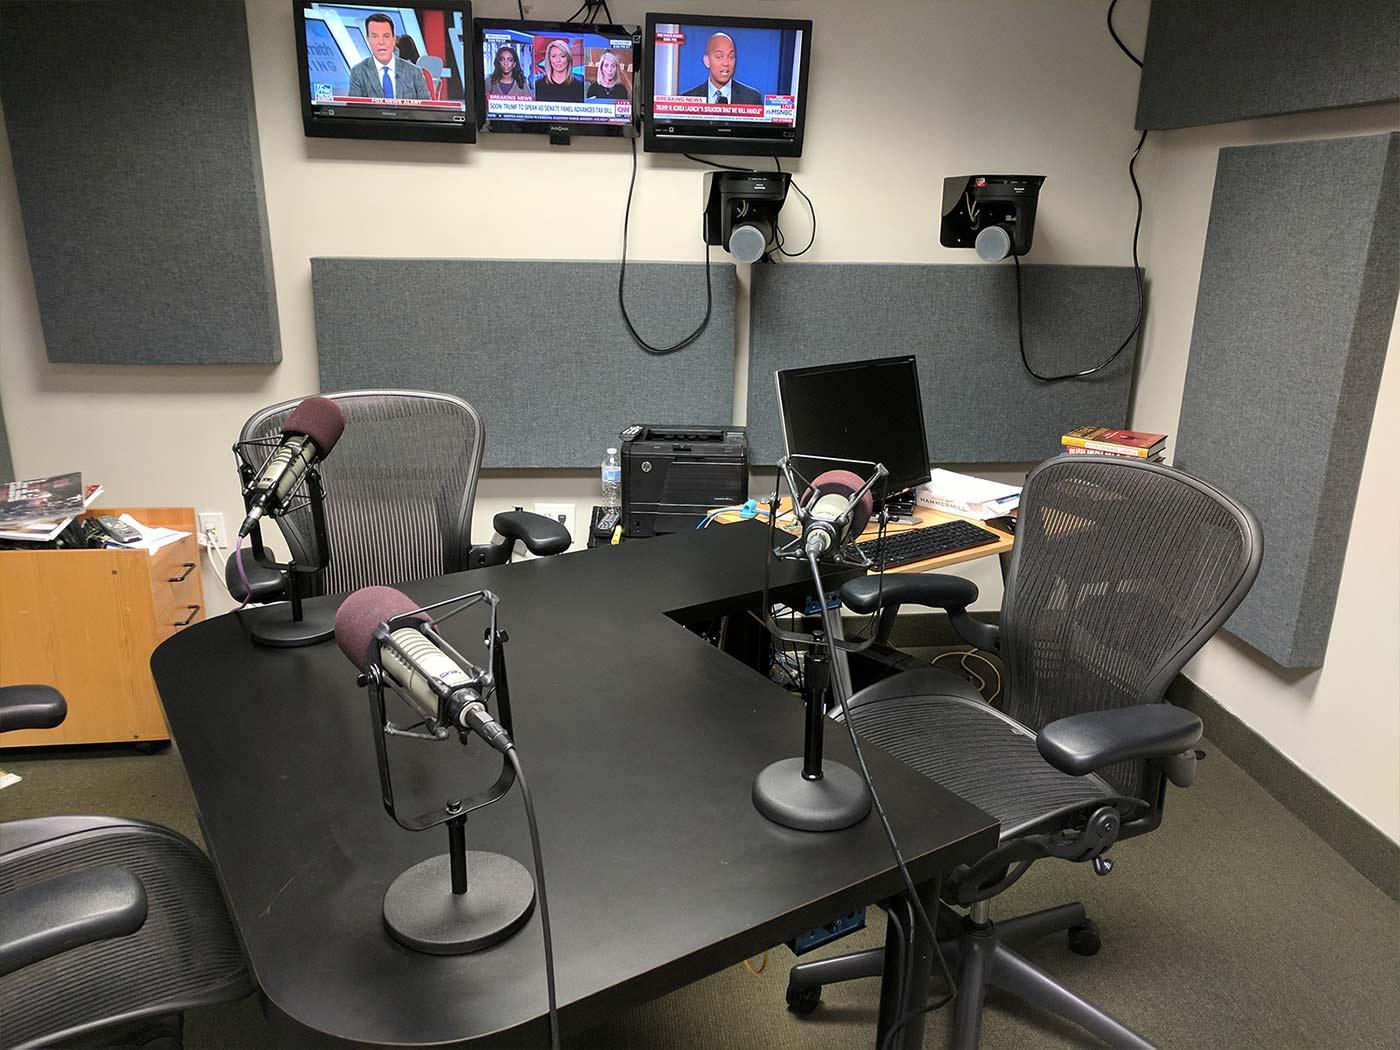 Podcast Studio Rentals In Washington, DC - District Productive